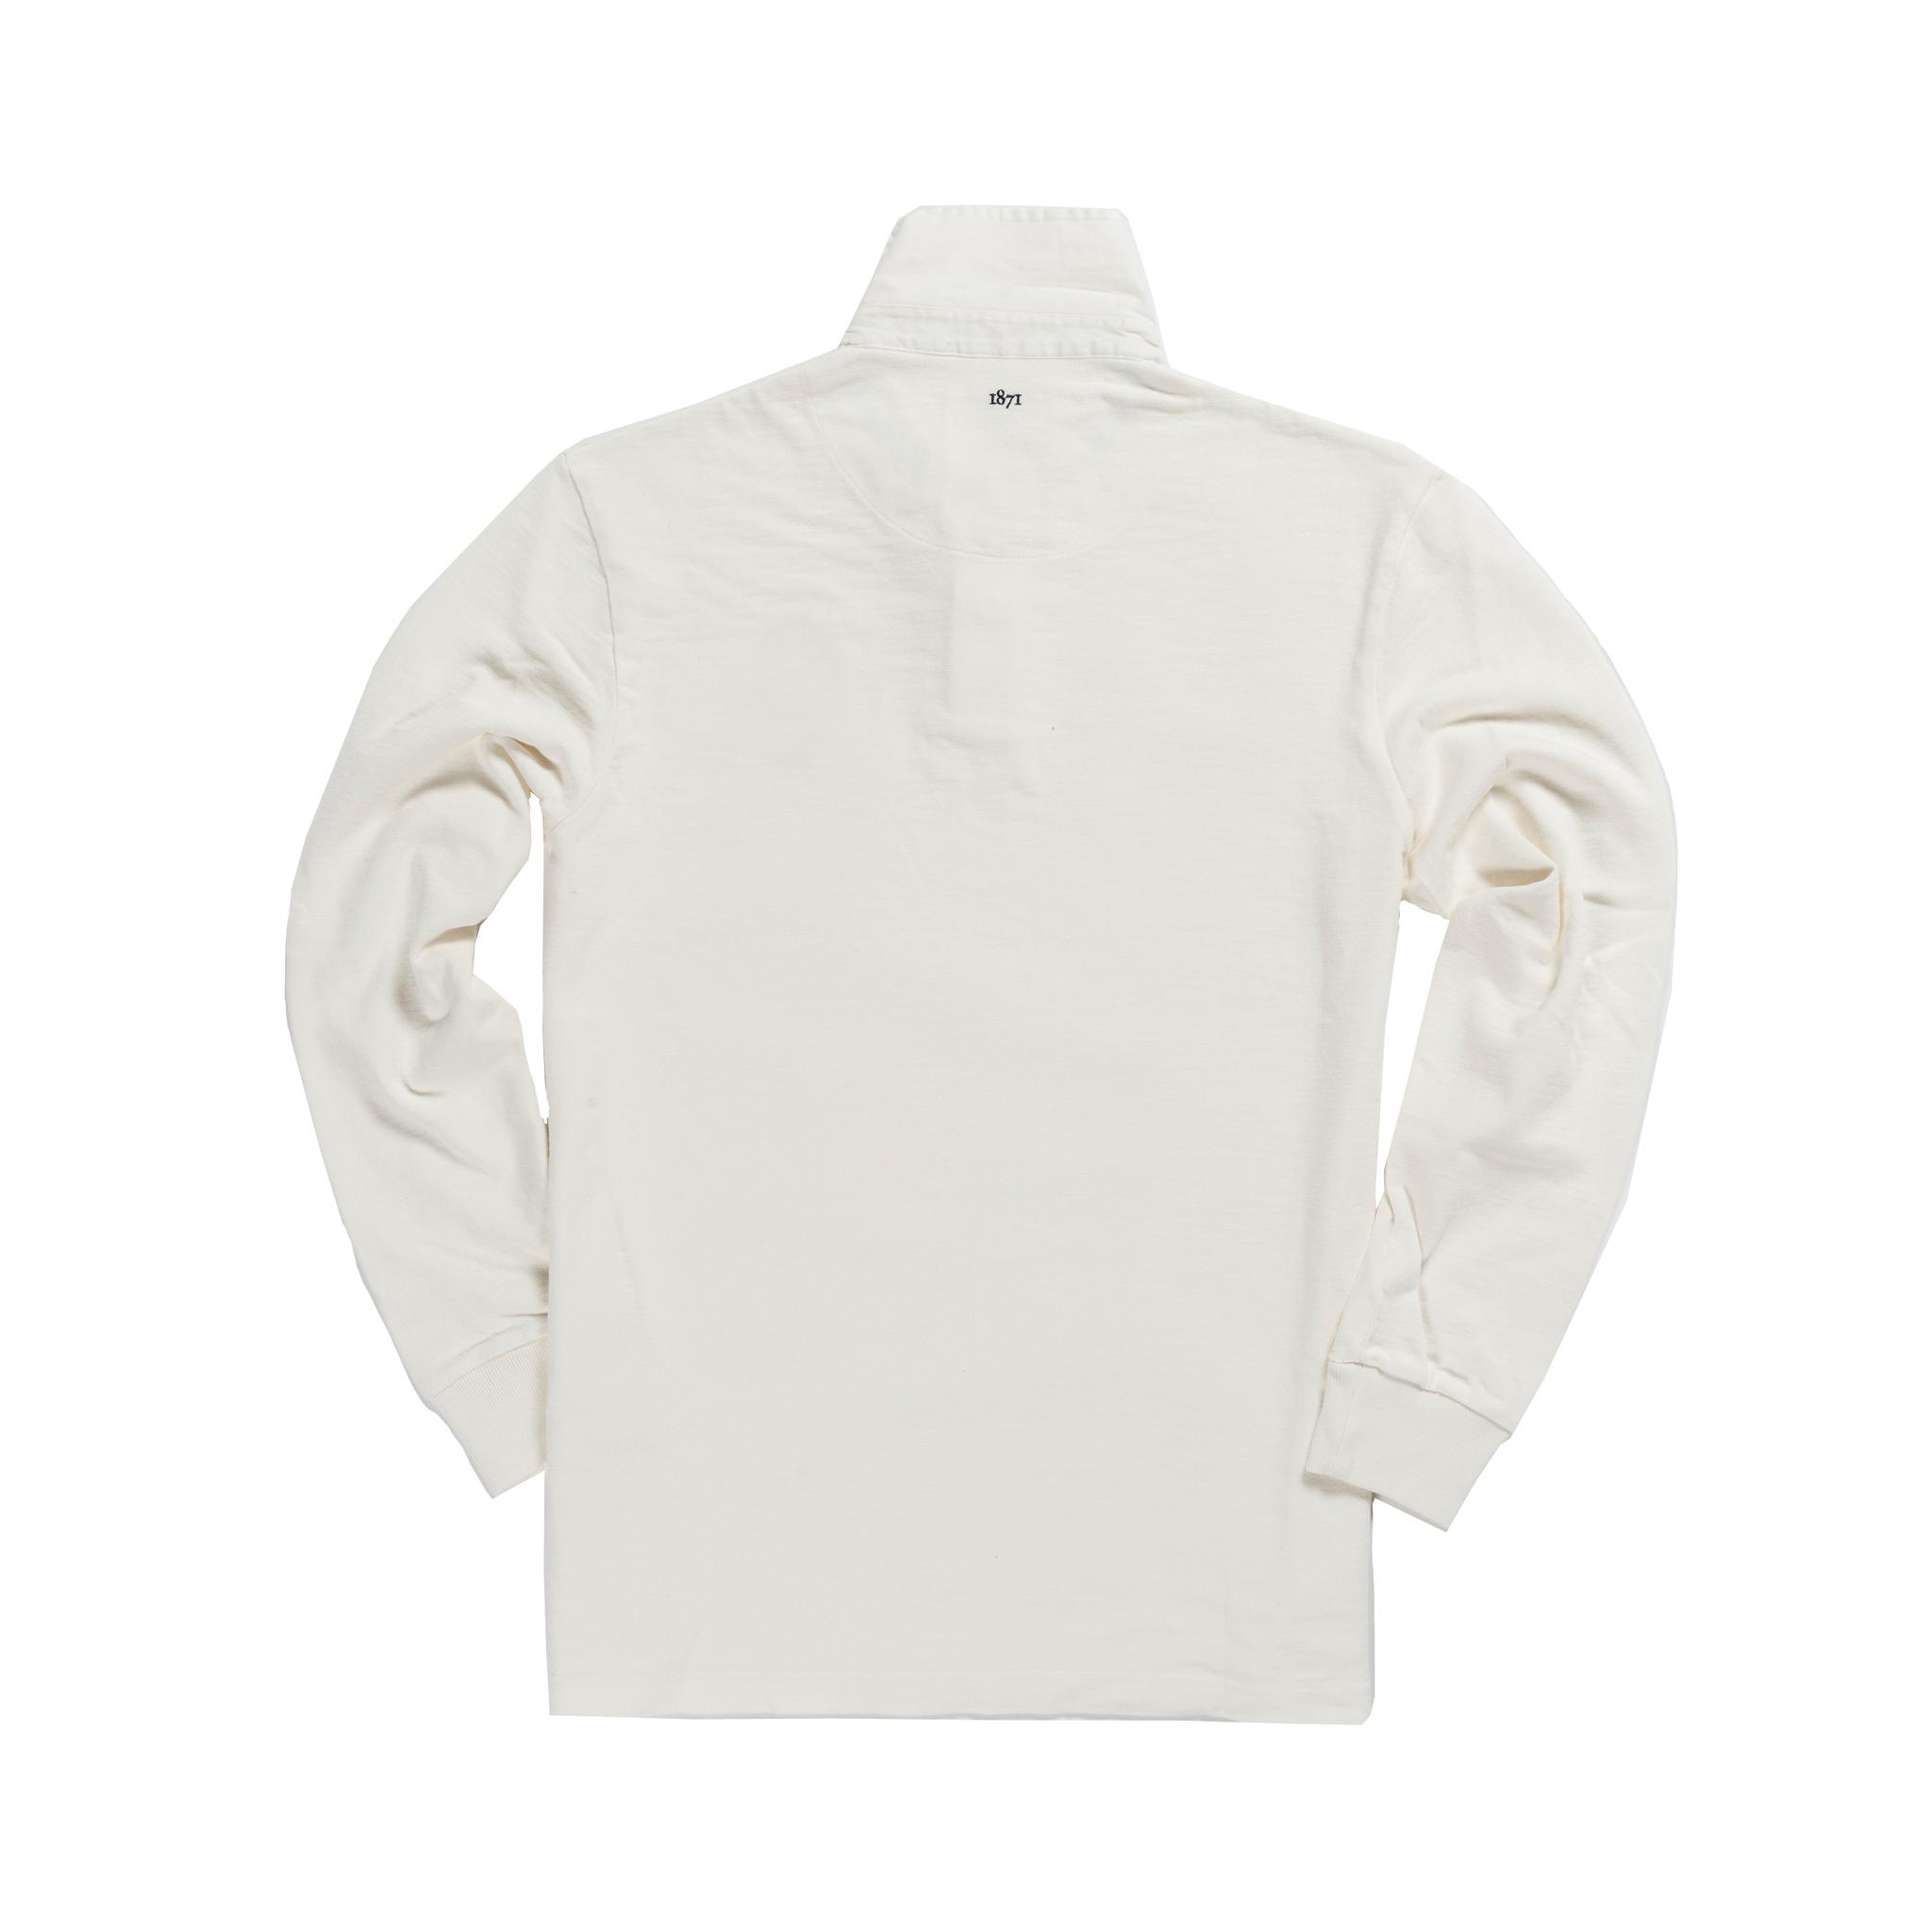 Pembroke 1842 Rugby Shirt White_Back